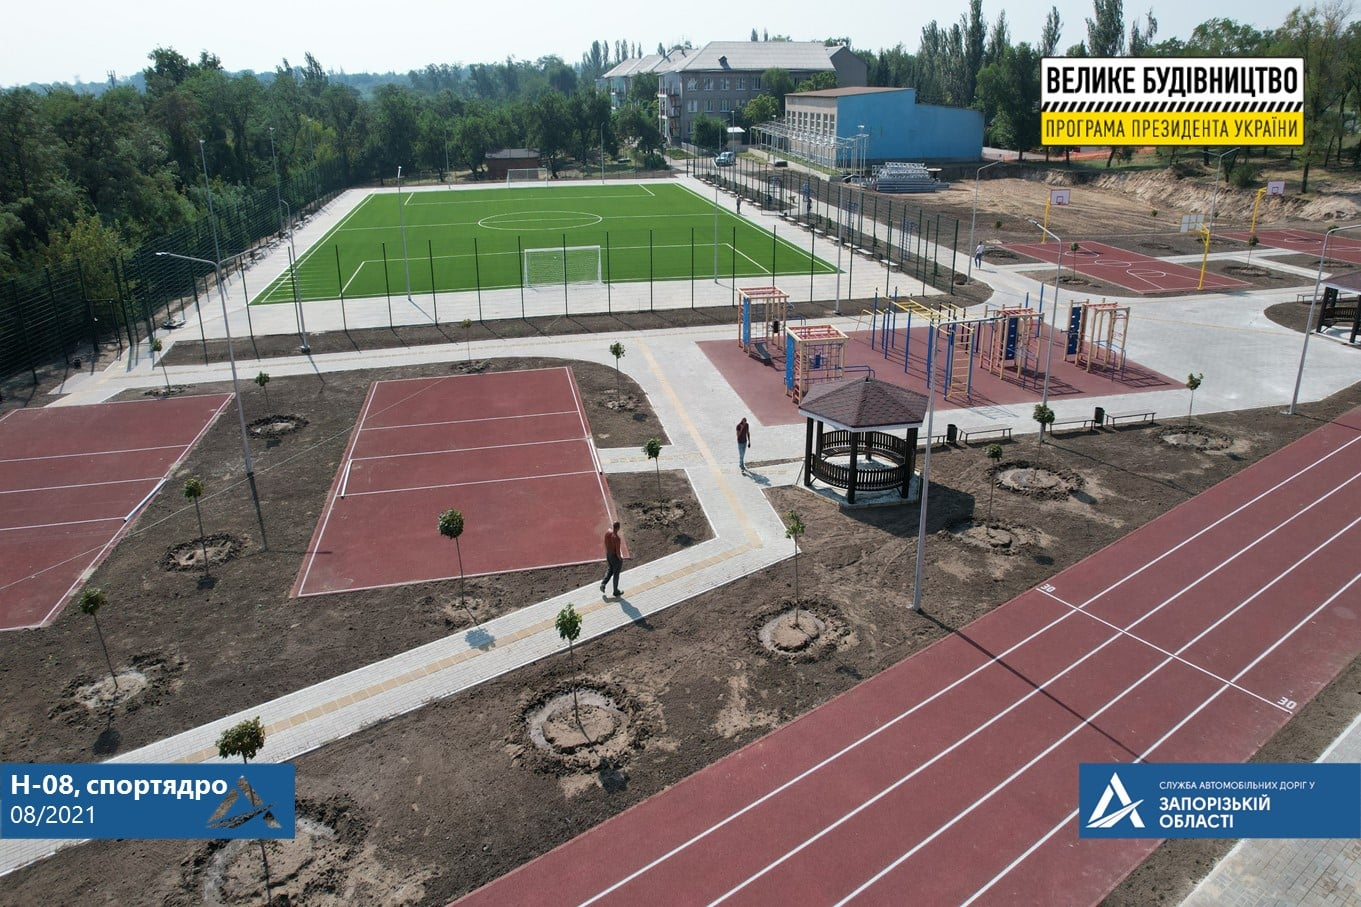 На Хортице завершена реконструкция спортивного комплекса